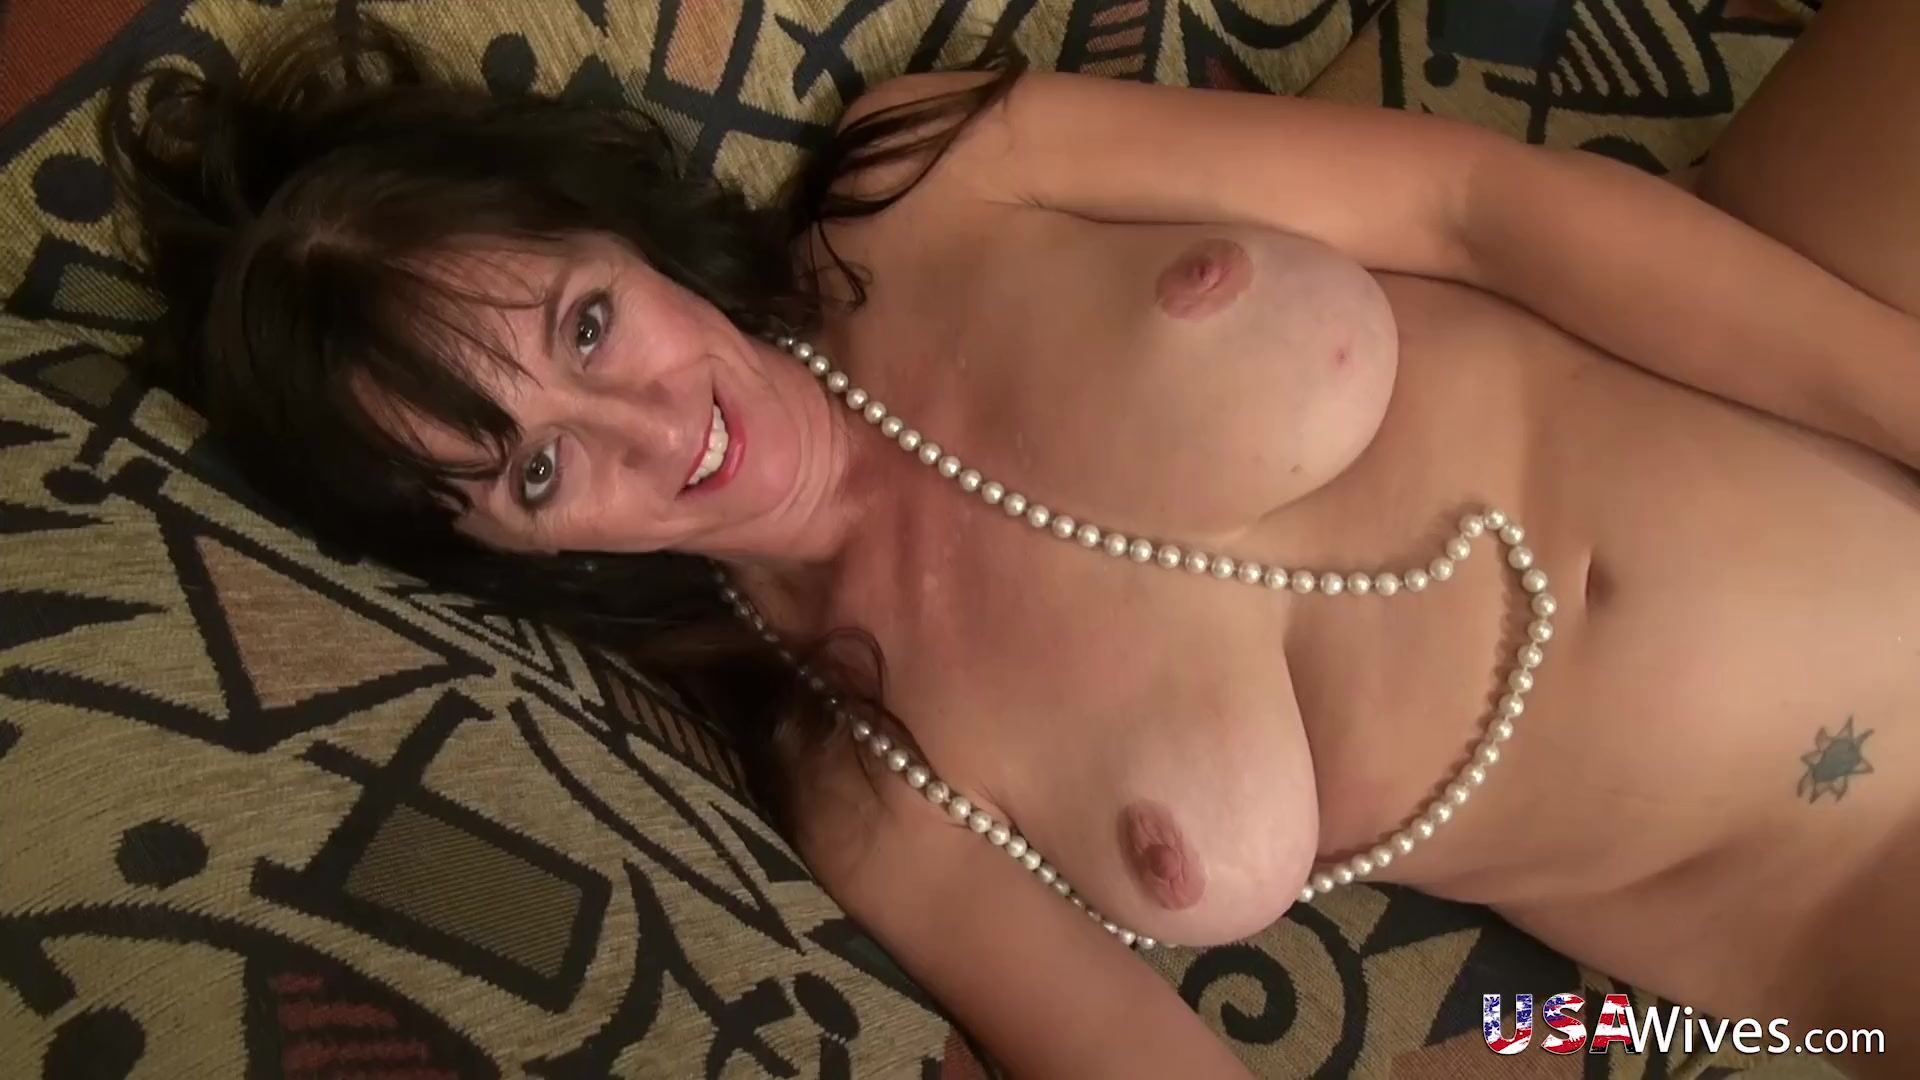 Porn perky tits anal